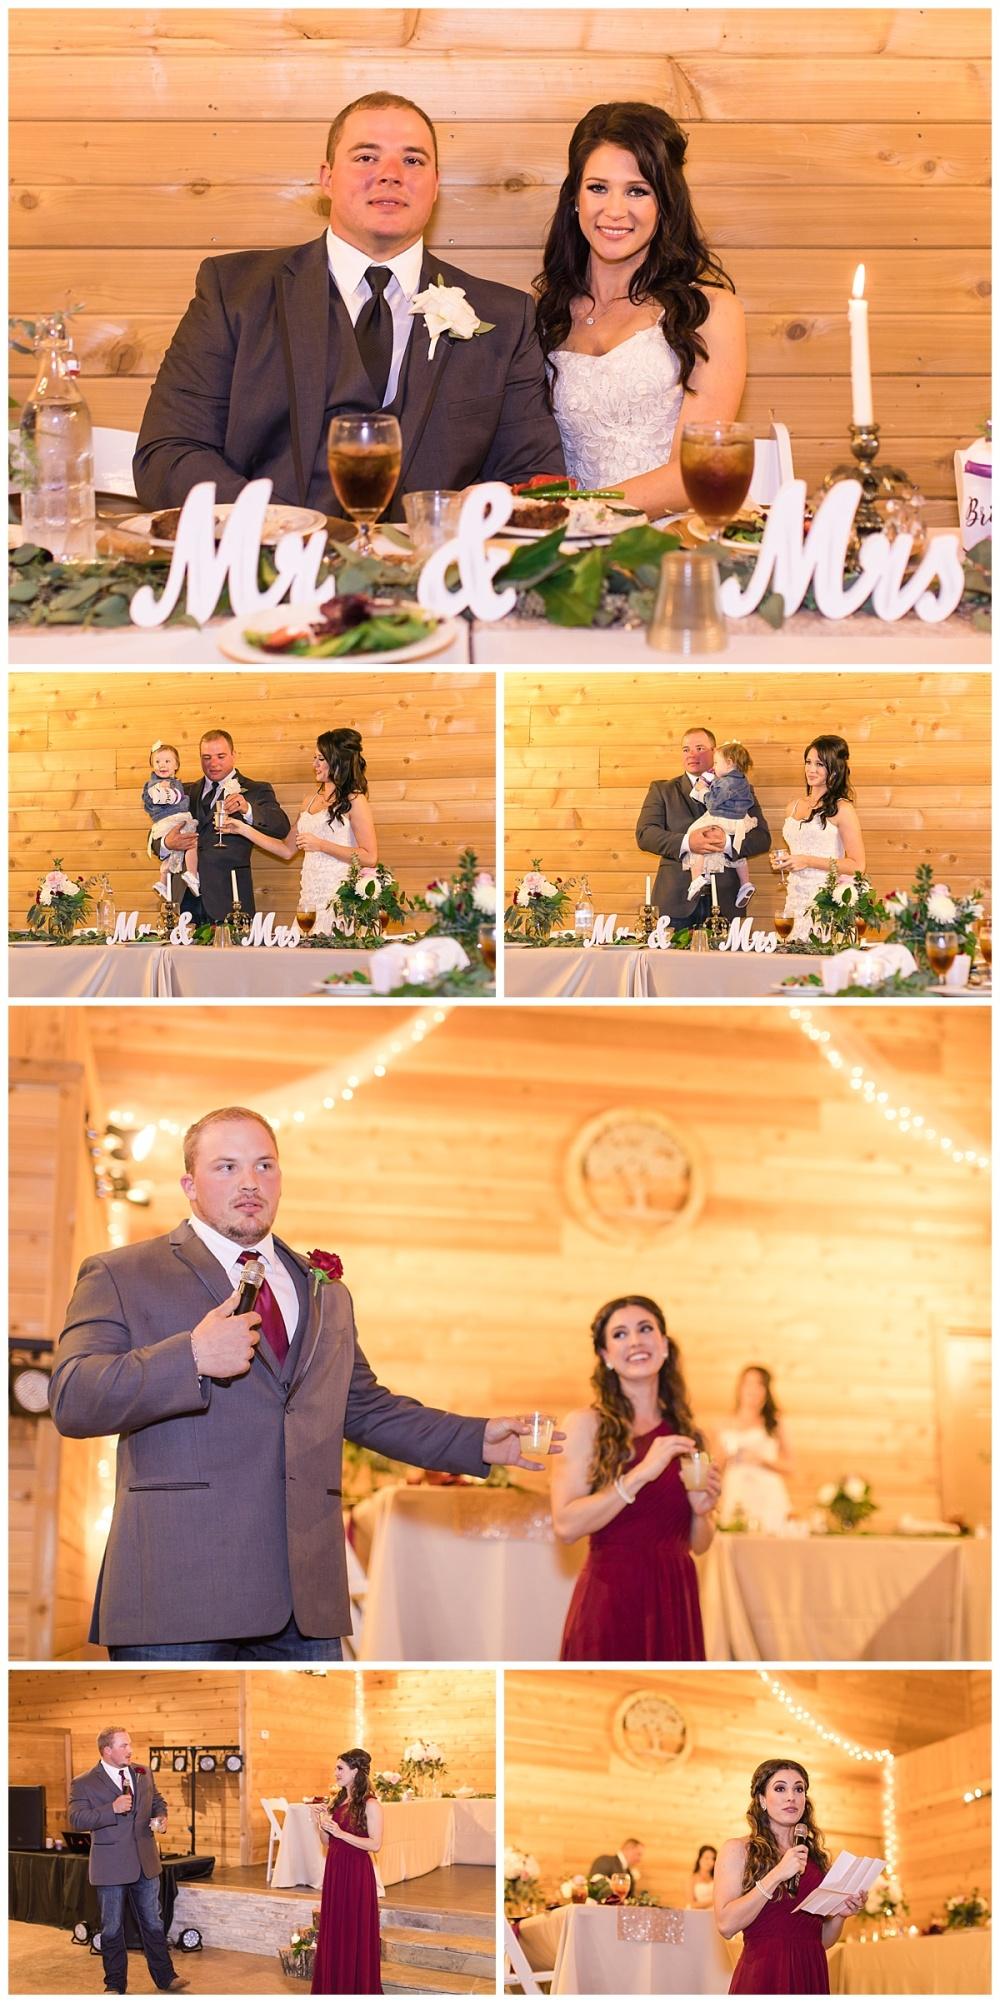 Carly-Barton-Photography-Geronimo-Oaks-Wedding-Venue-Texas-Hill-Country-Ronnie-Sarah_0130.jpg